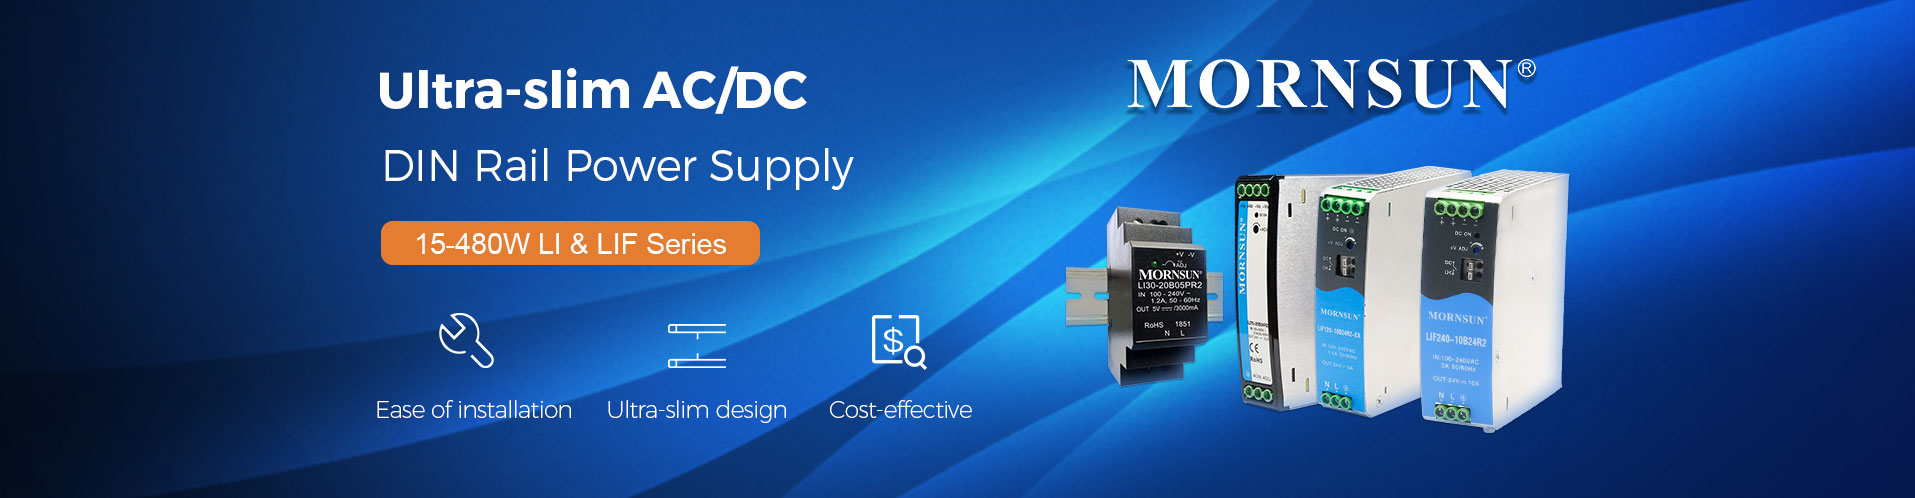 Ultra Slim AC/DC DIN-Rail Power Supply 15-480W LI & LIF Series